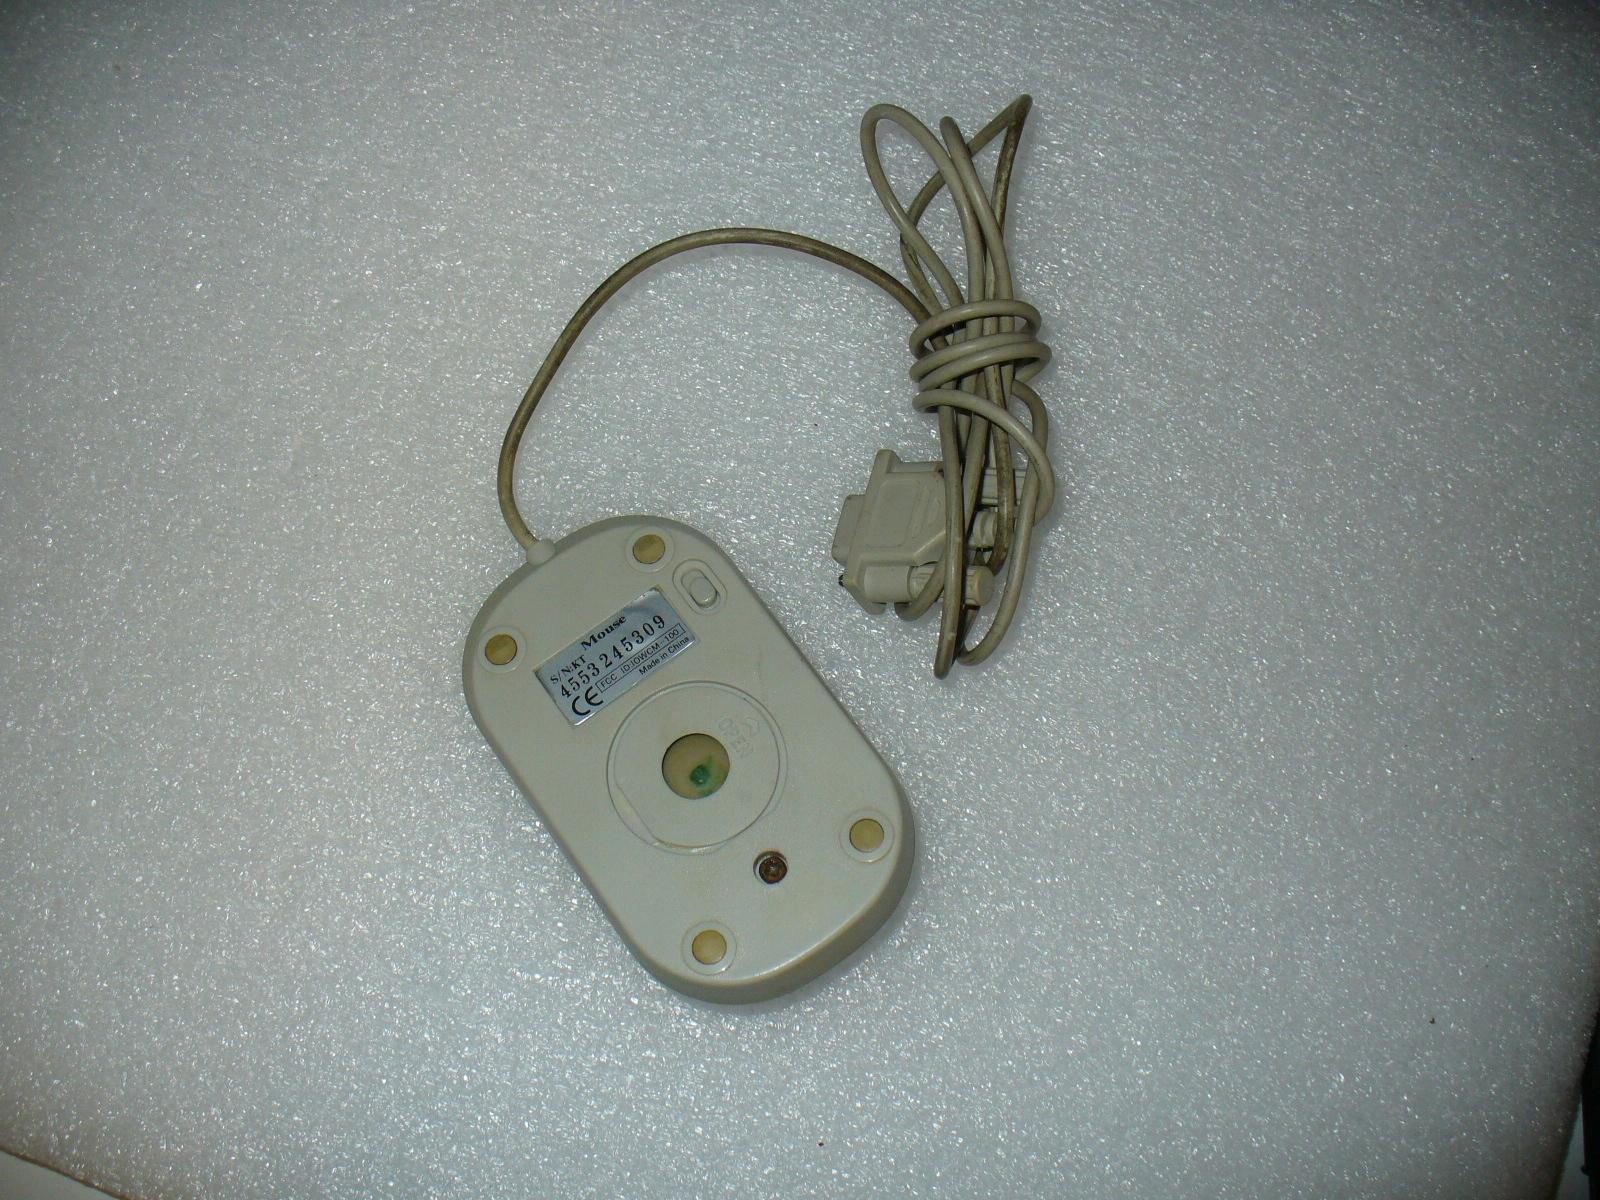 FCC ID IOWCM DRIVER UPDATE